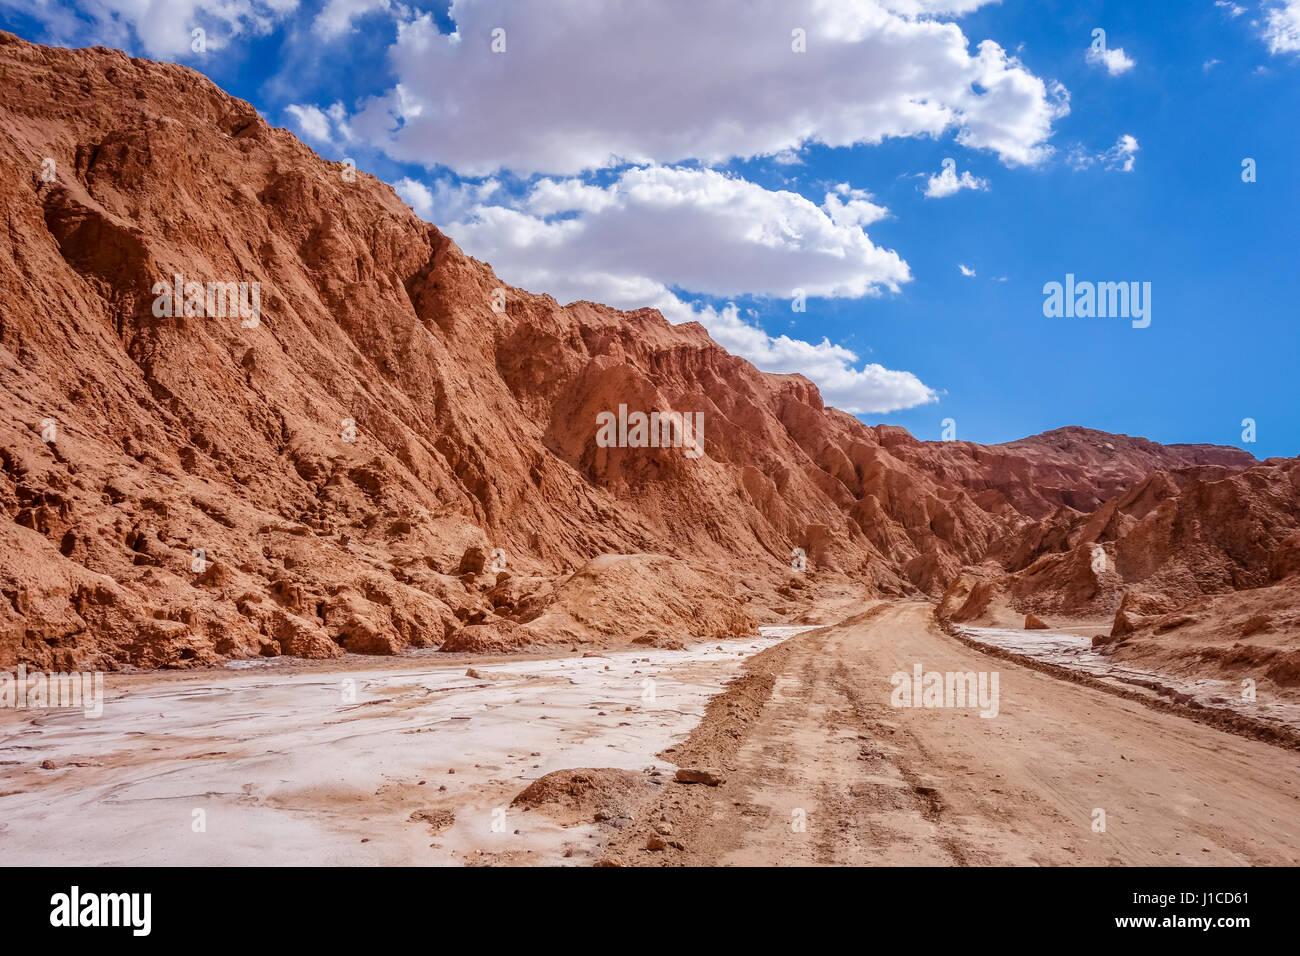 Valle de la muerte landscape in San Pedro de Atacama, Chile - Stock Image